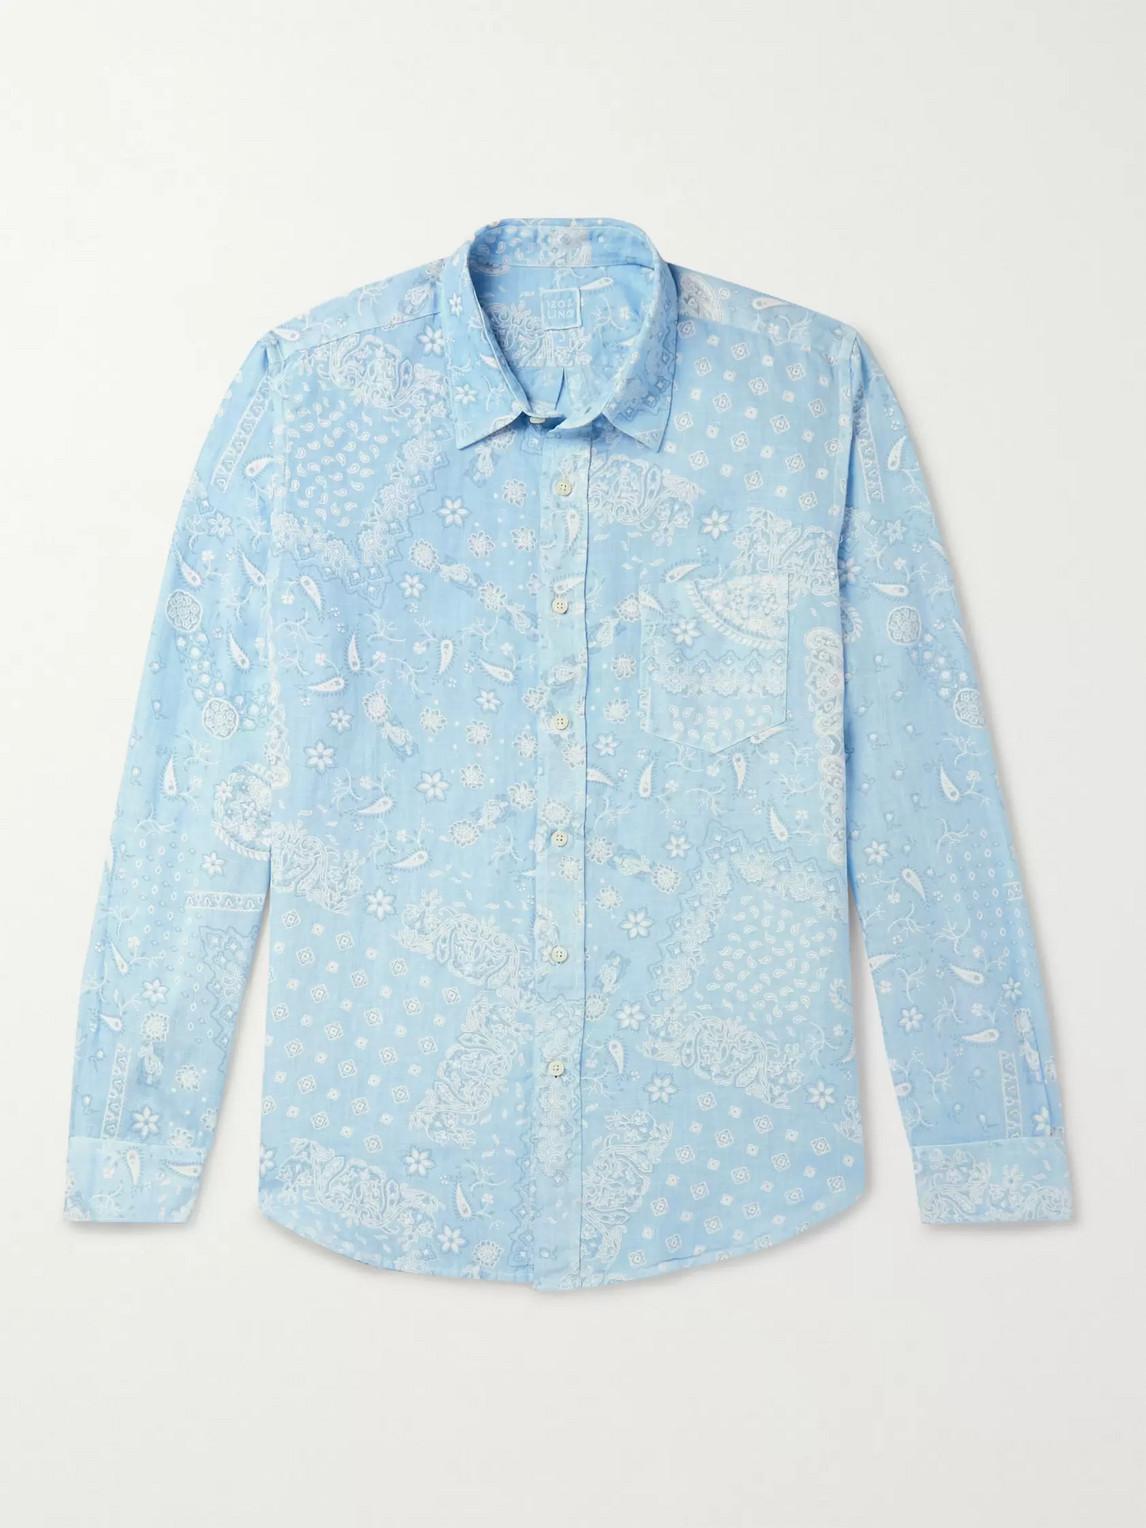 120% Paisley-print Linen Shirt In Blue